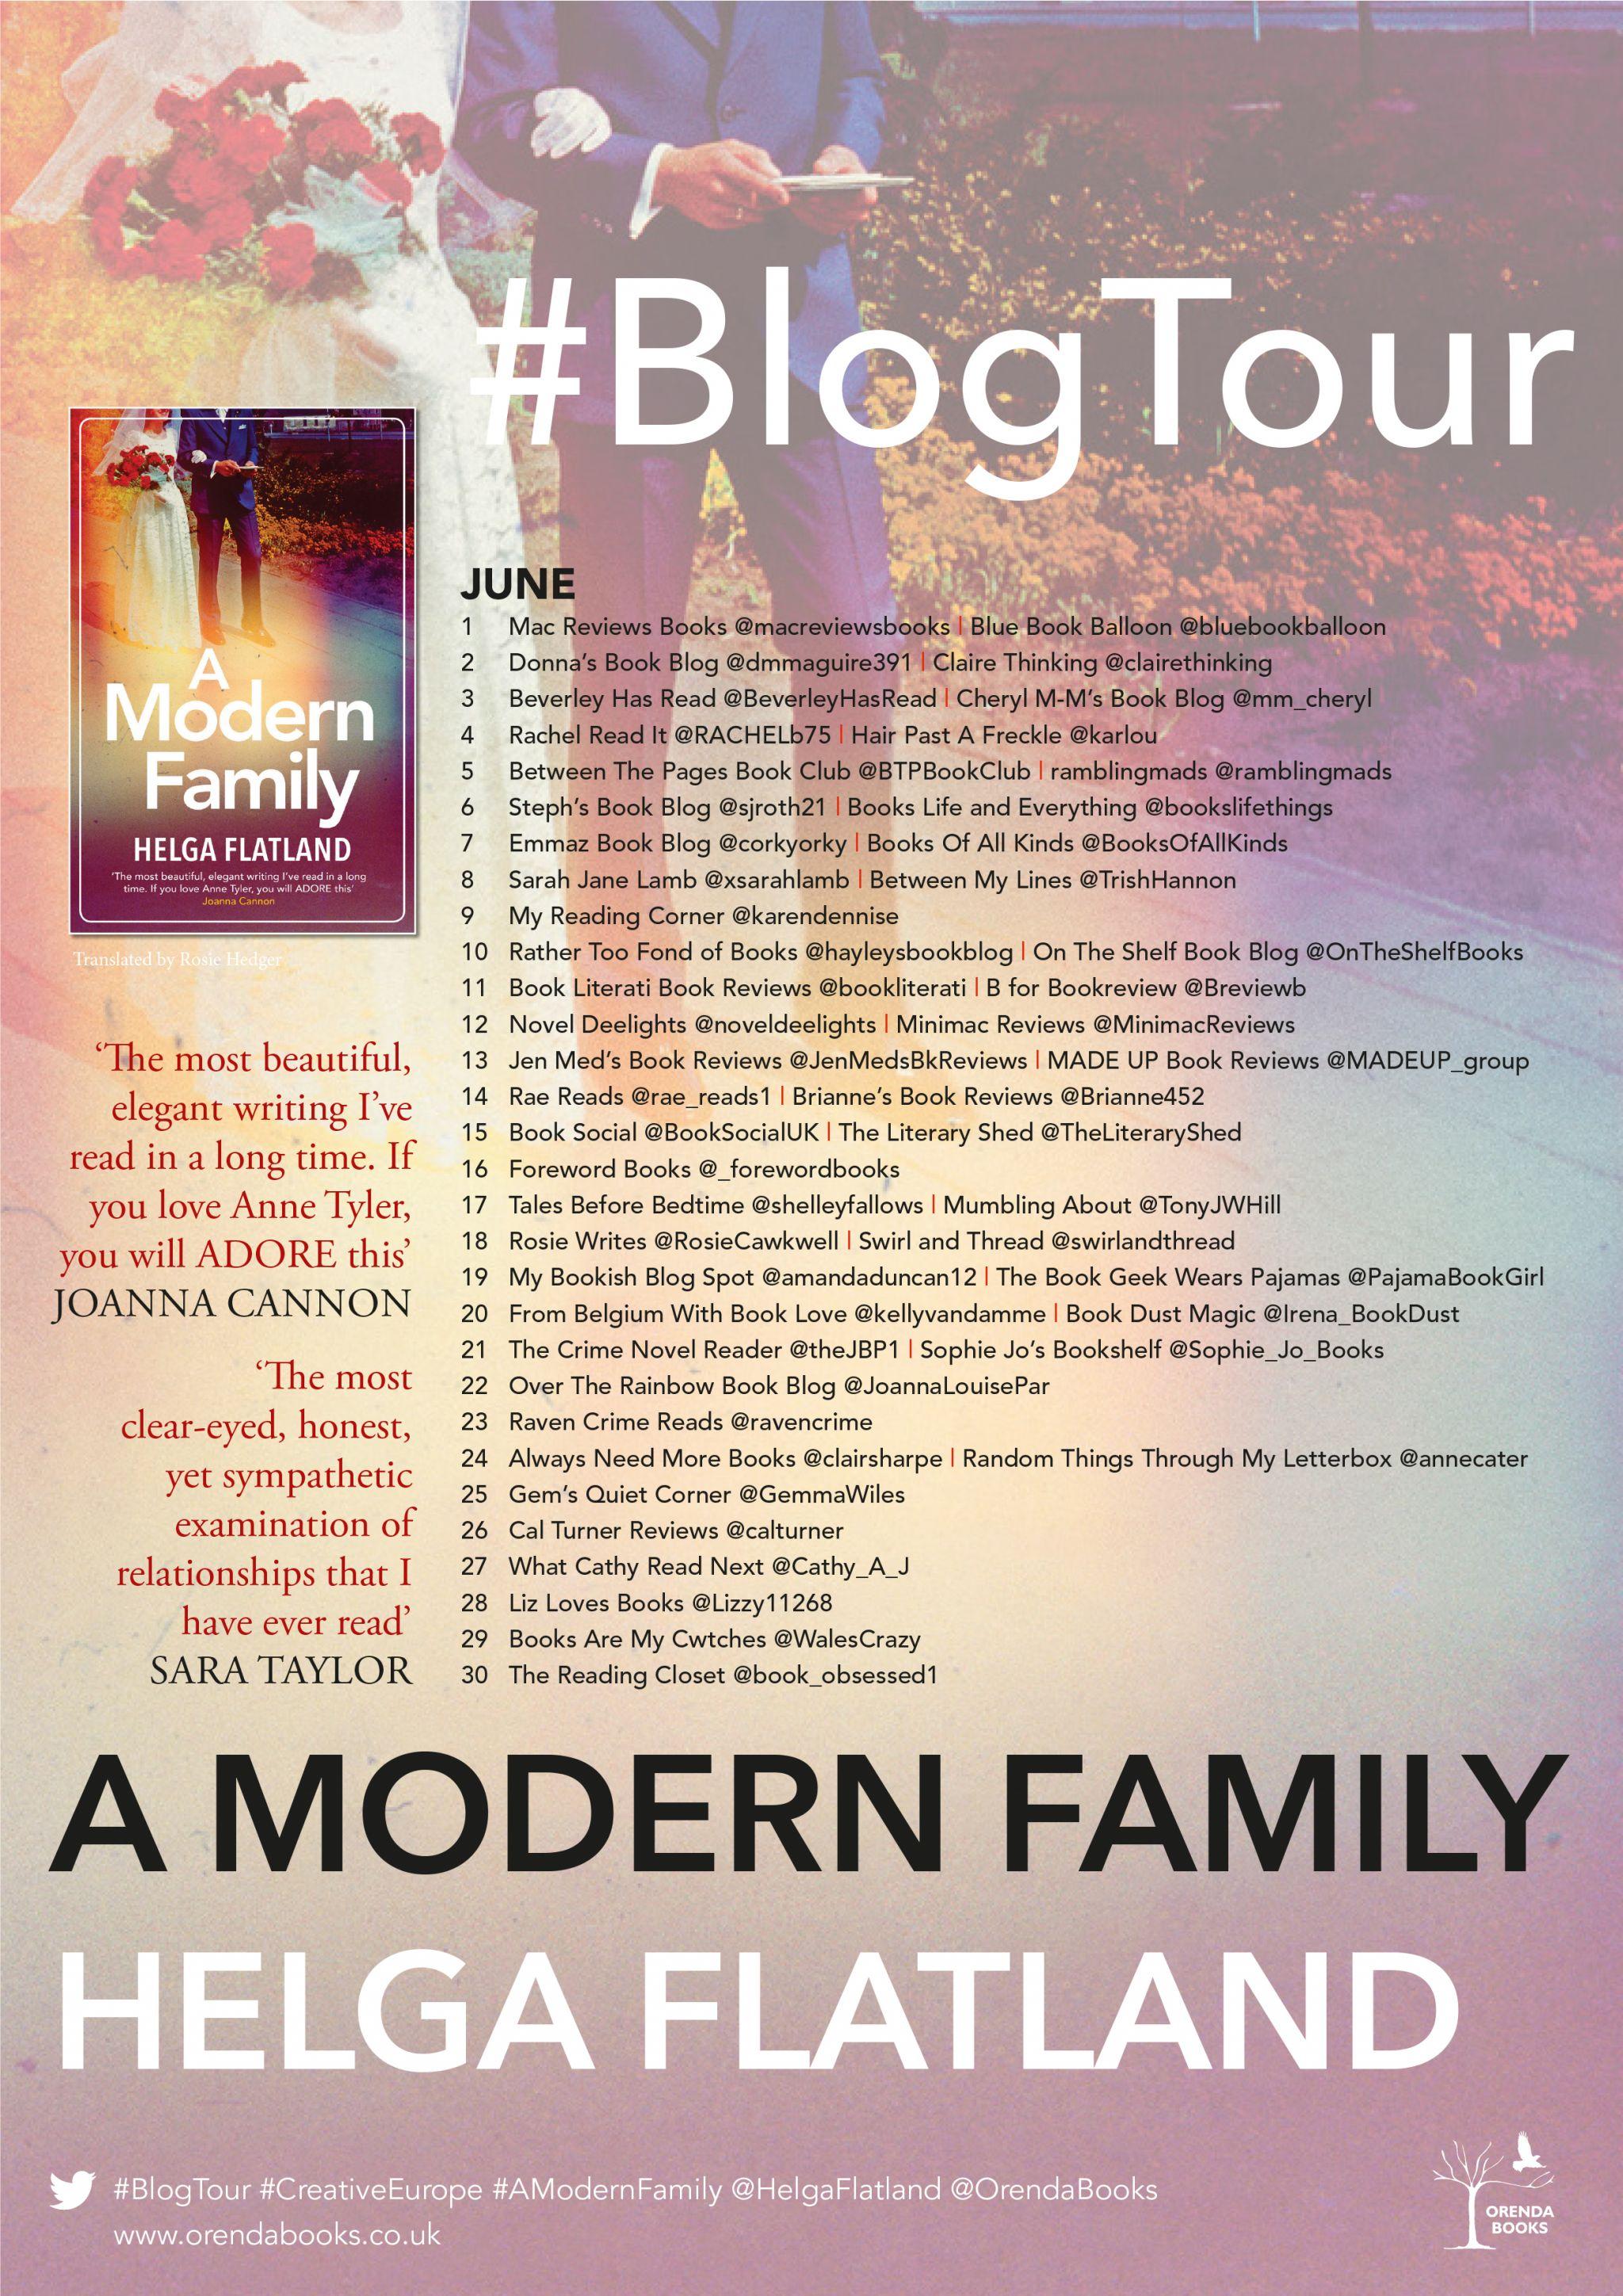 A Modern Family – Helga Flatland